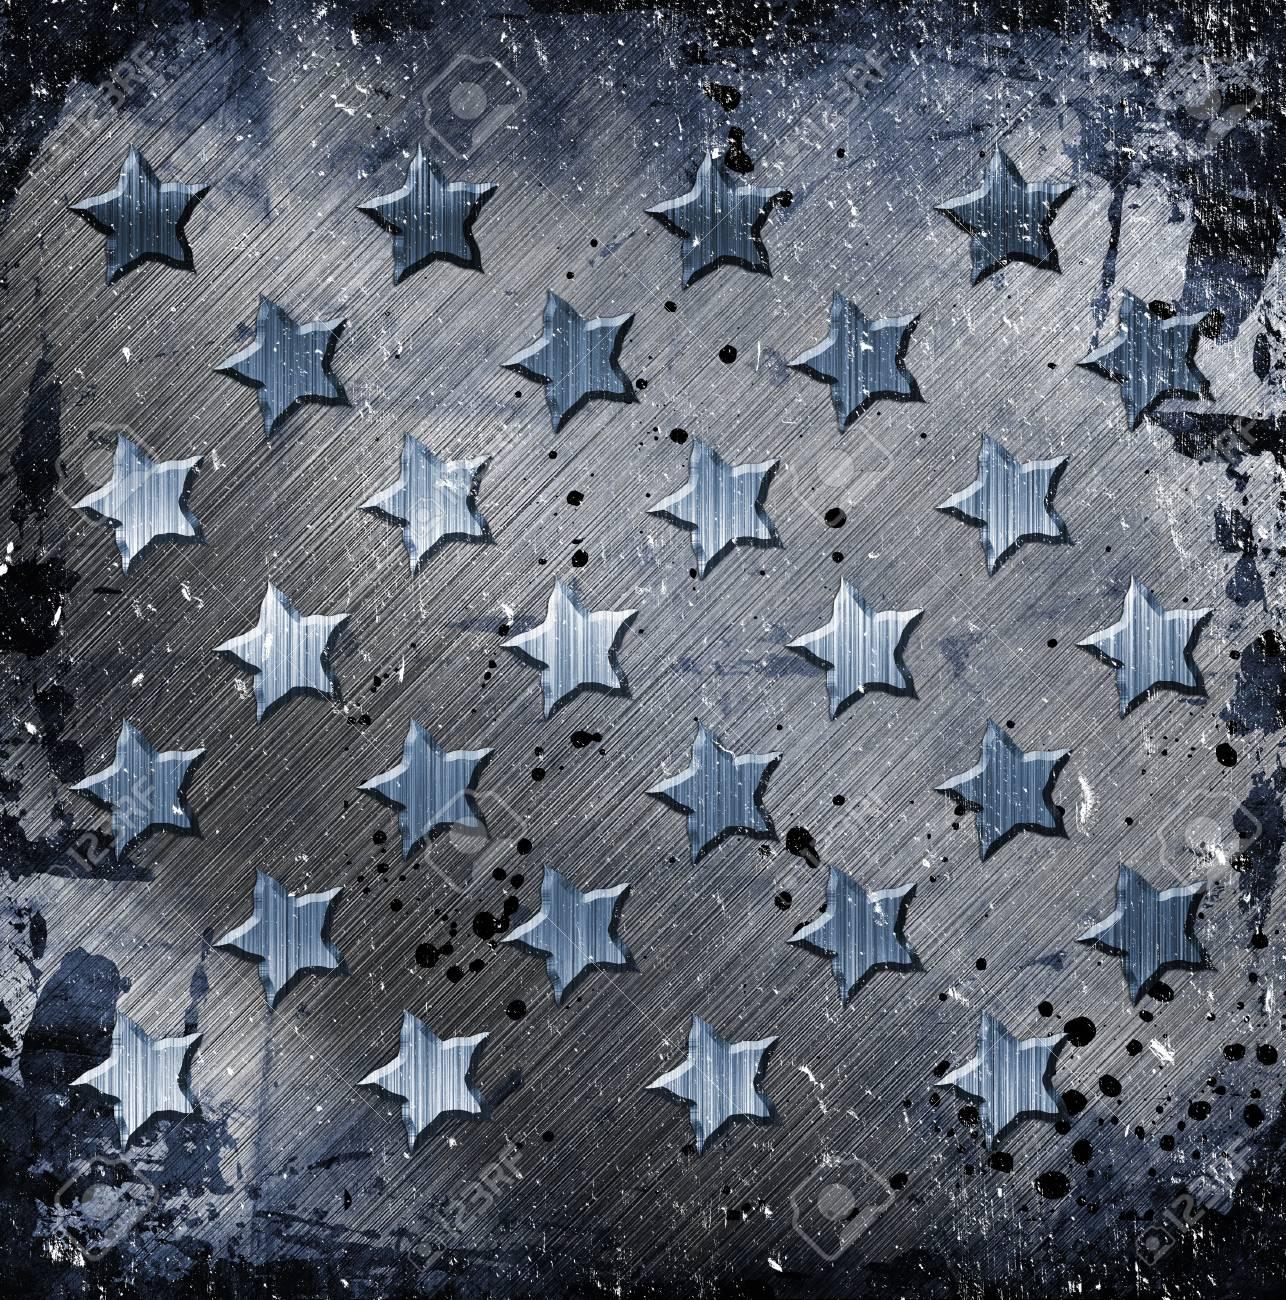 Military Grunge With Stars Stock Photo - 14669622